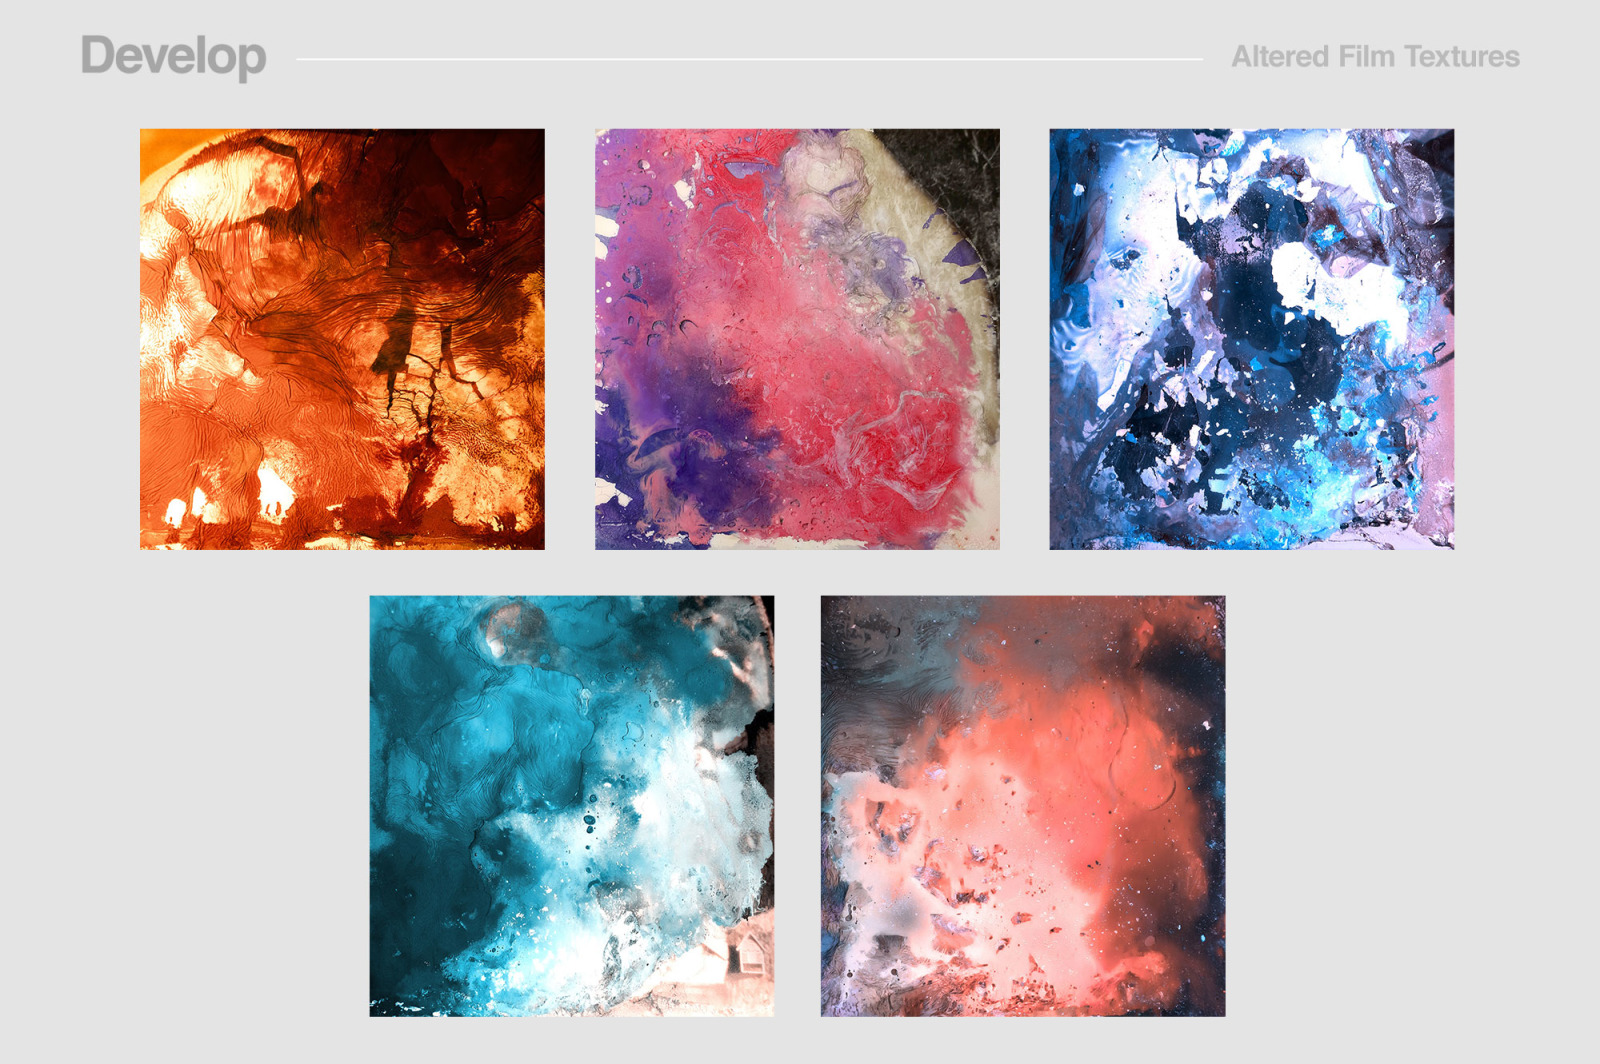 Develop: Altered Film Textures